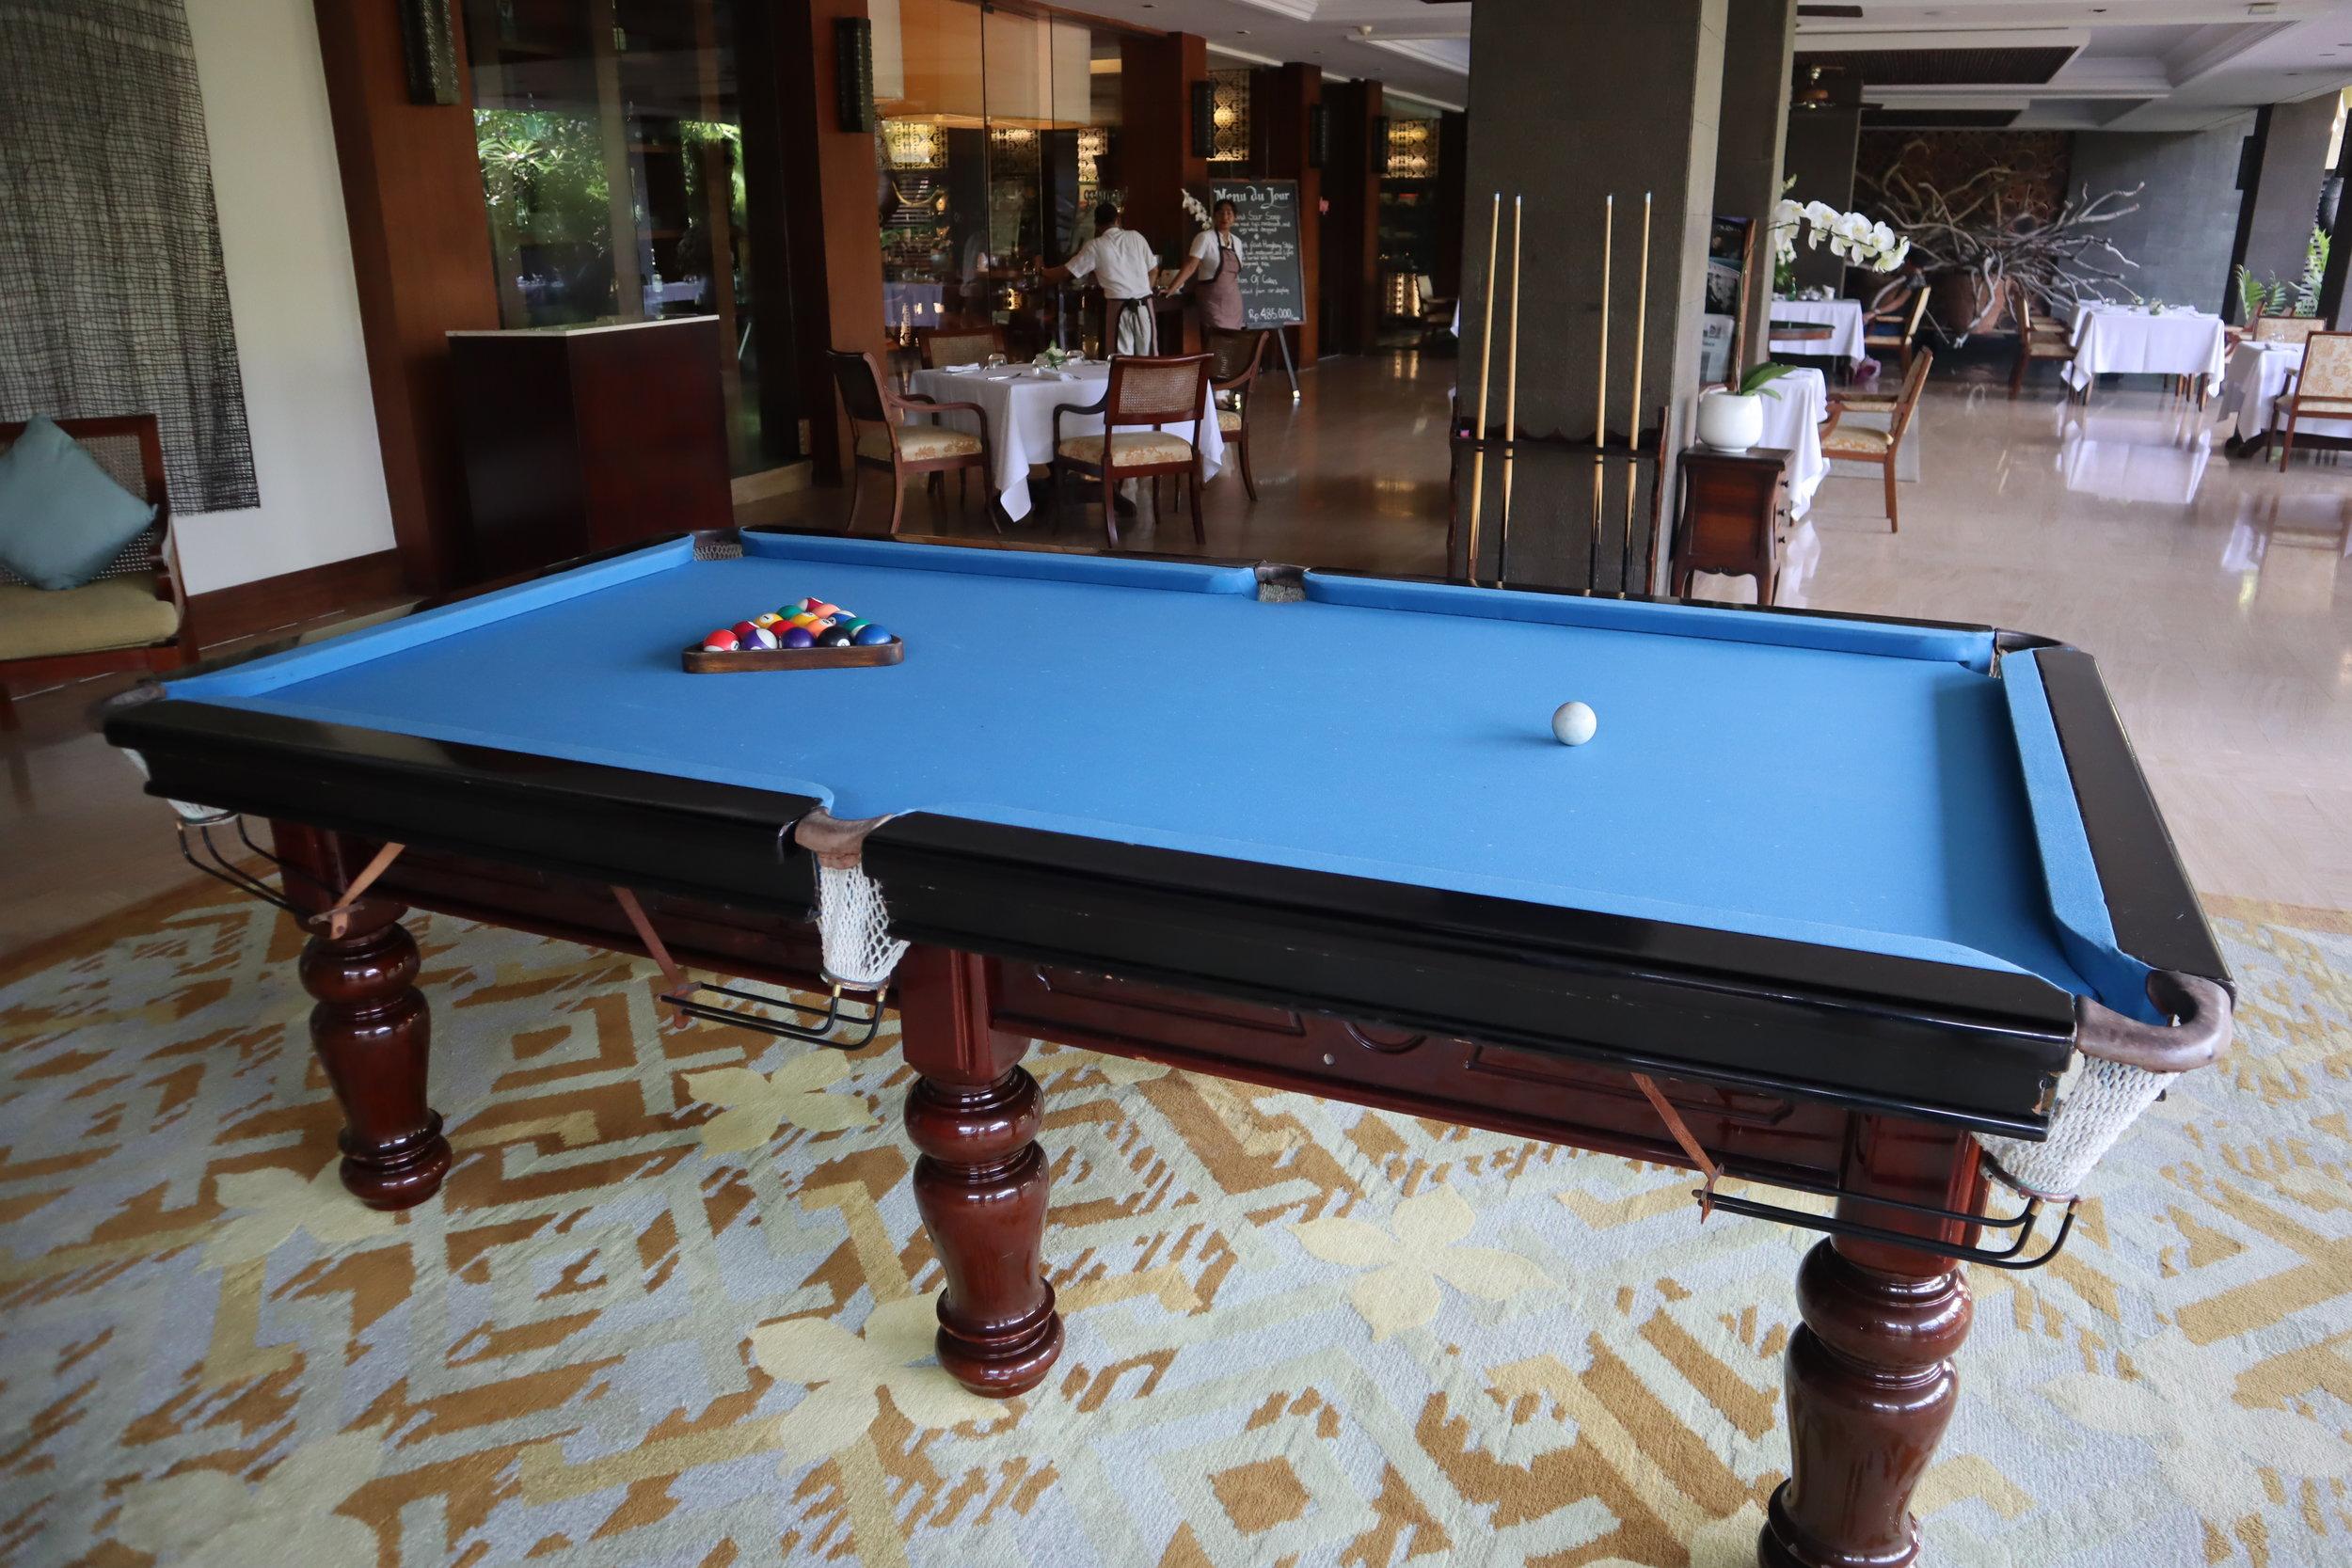 St. Regis Bali – Pool table